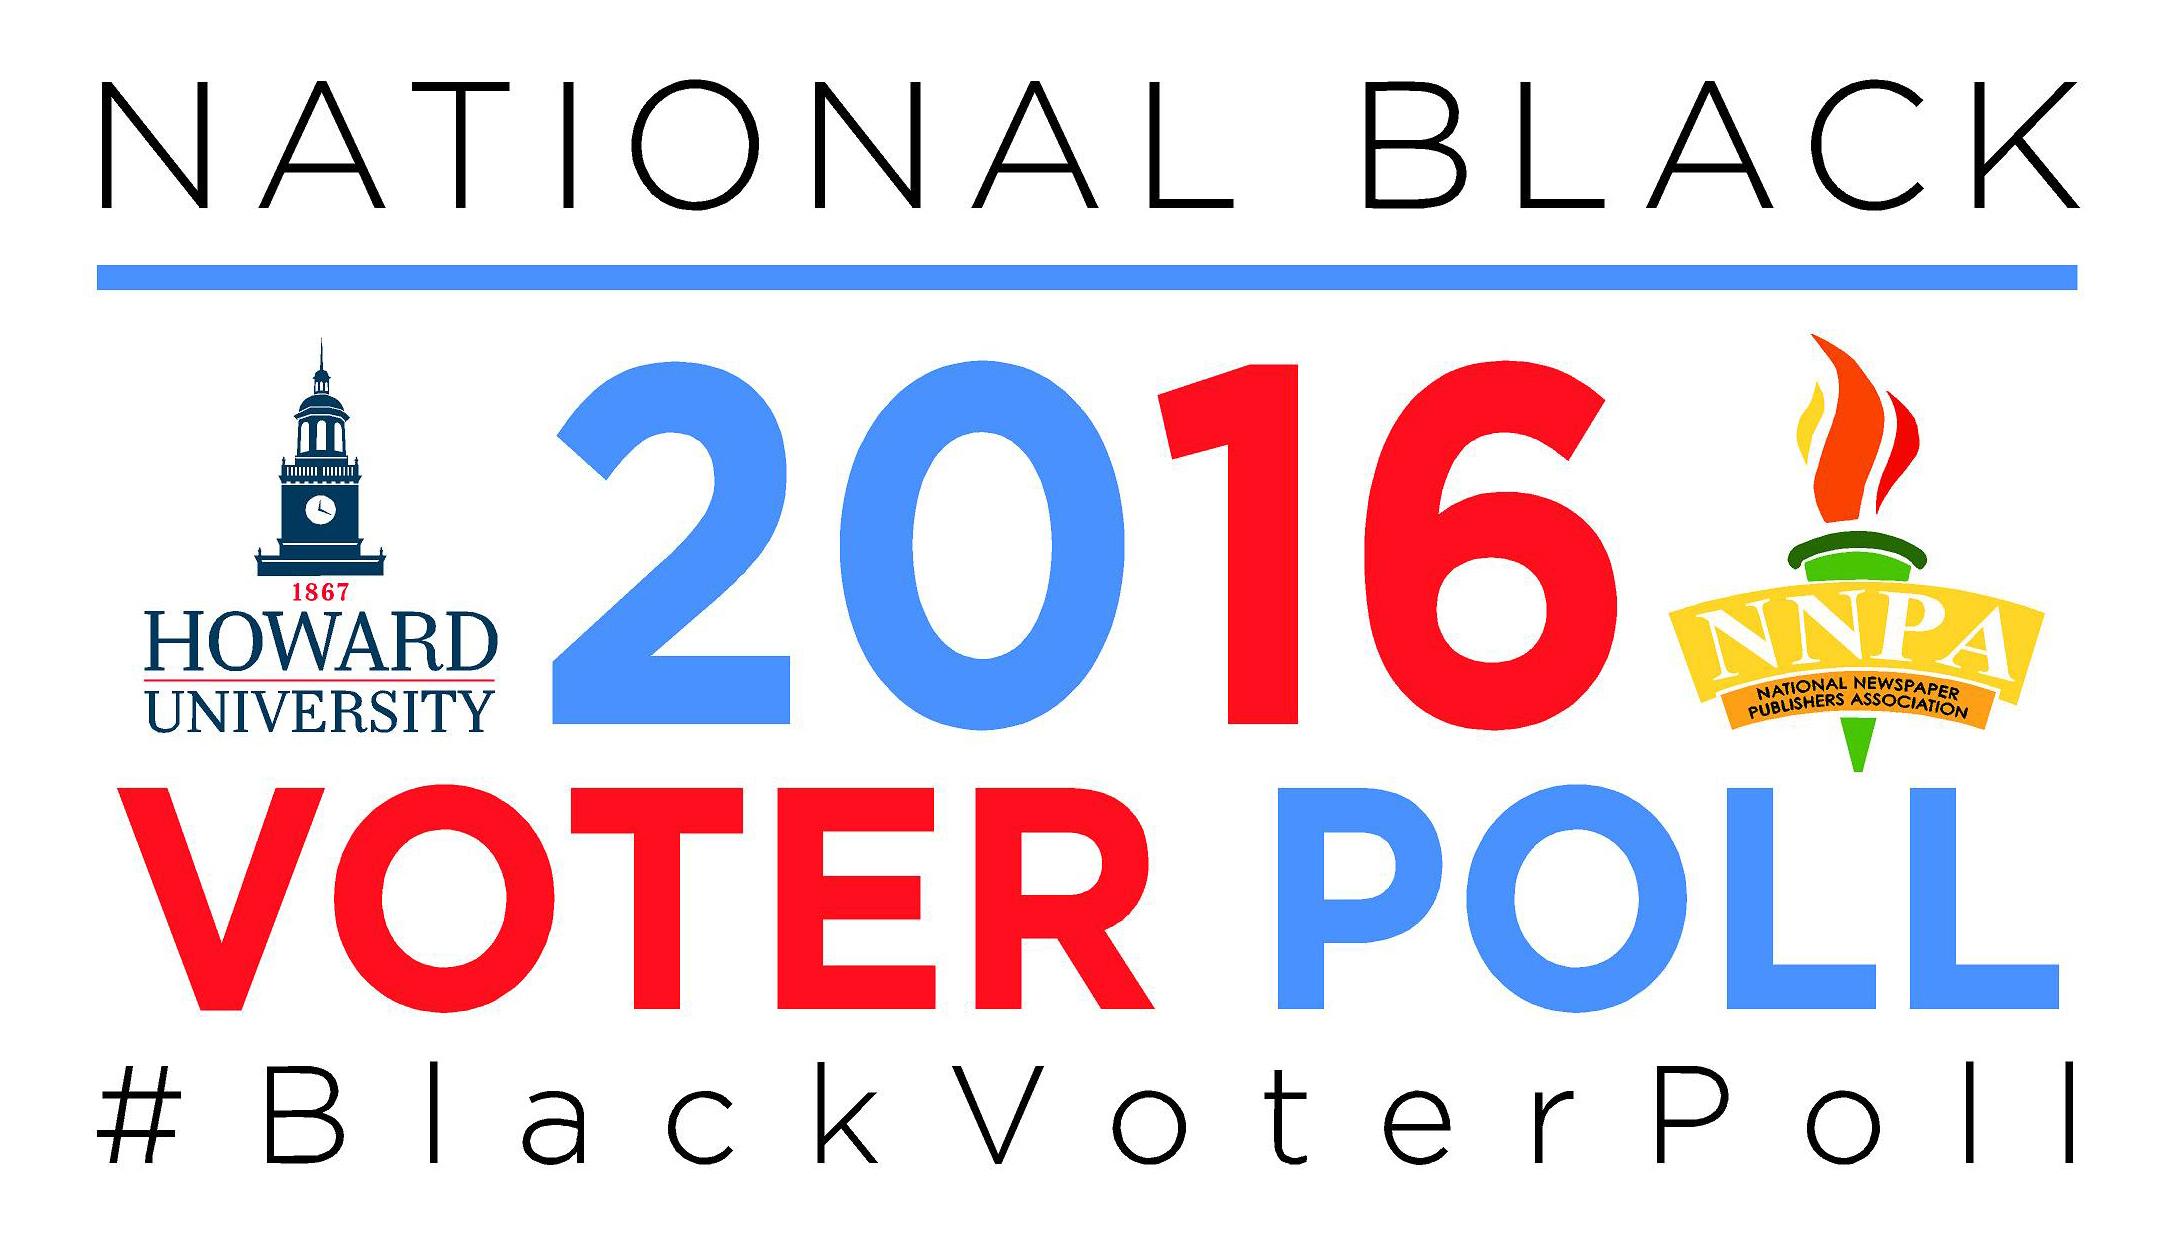 blackvoterpoll_nnpahu_graphic_web120